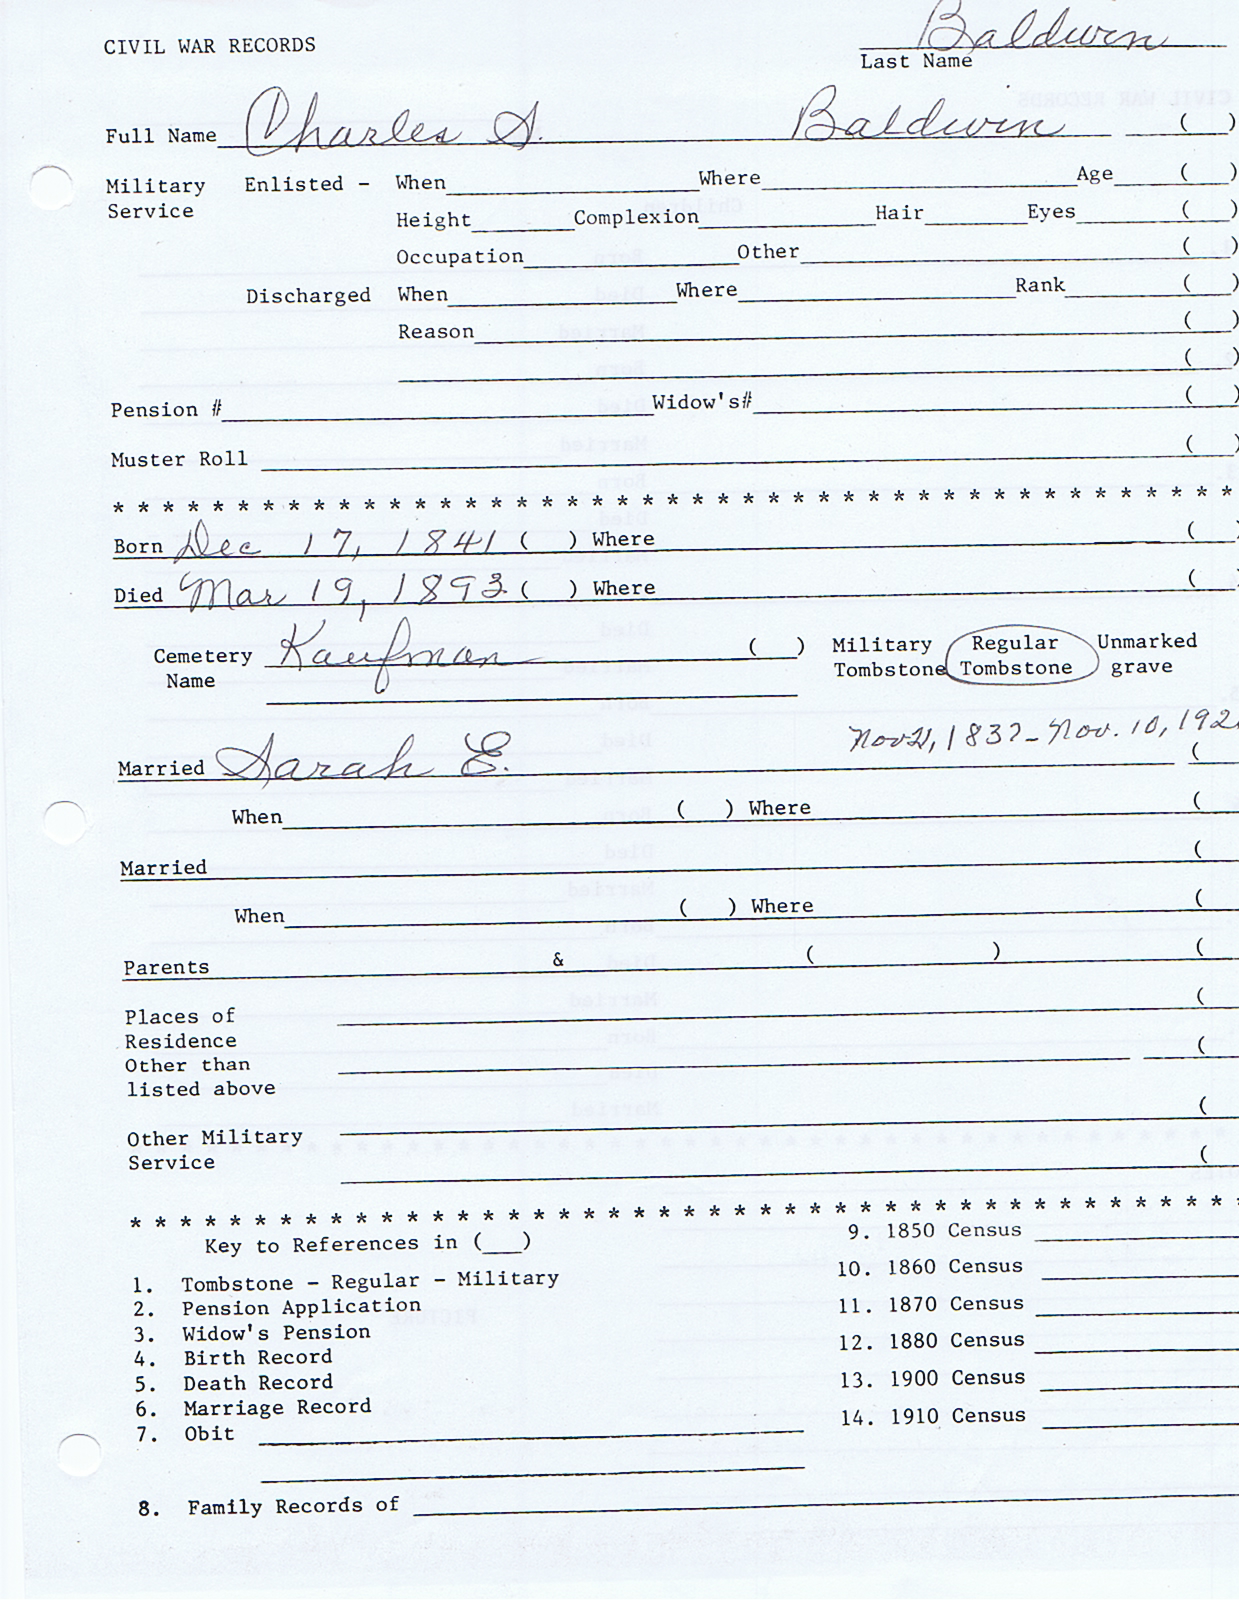 baldwin-kaufman_civil_war_records-3491